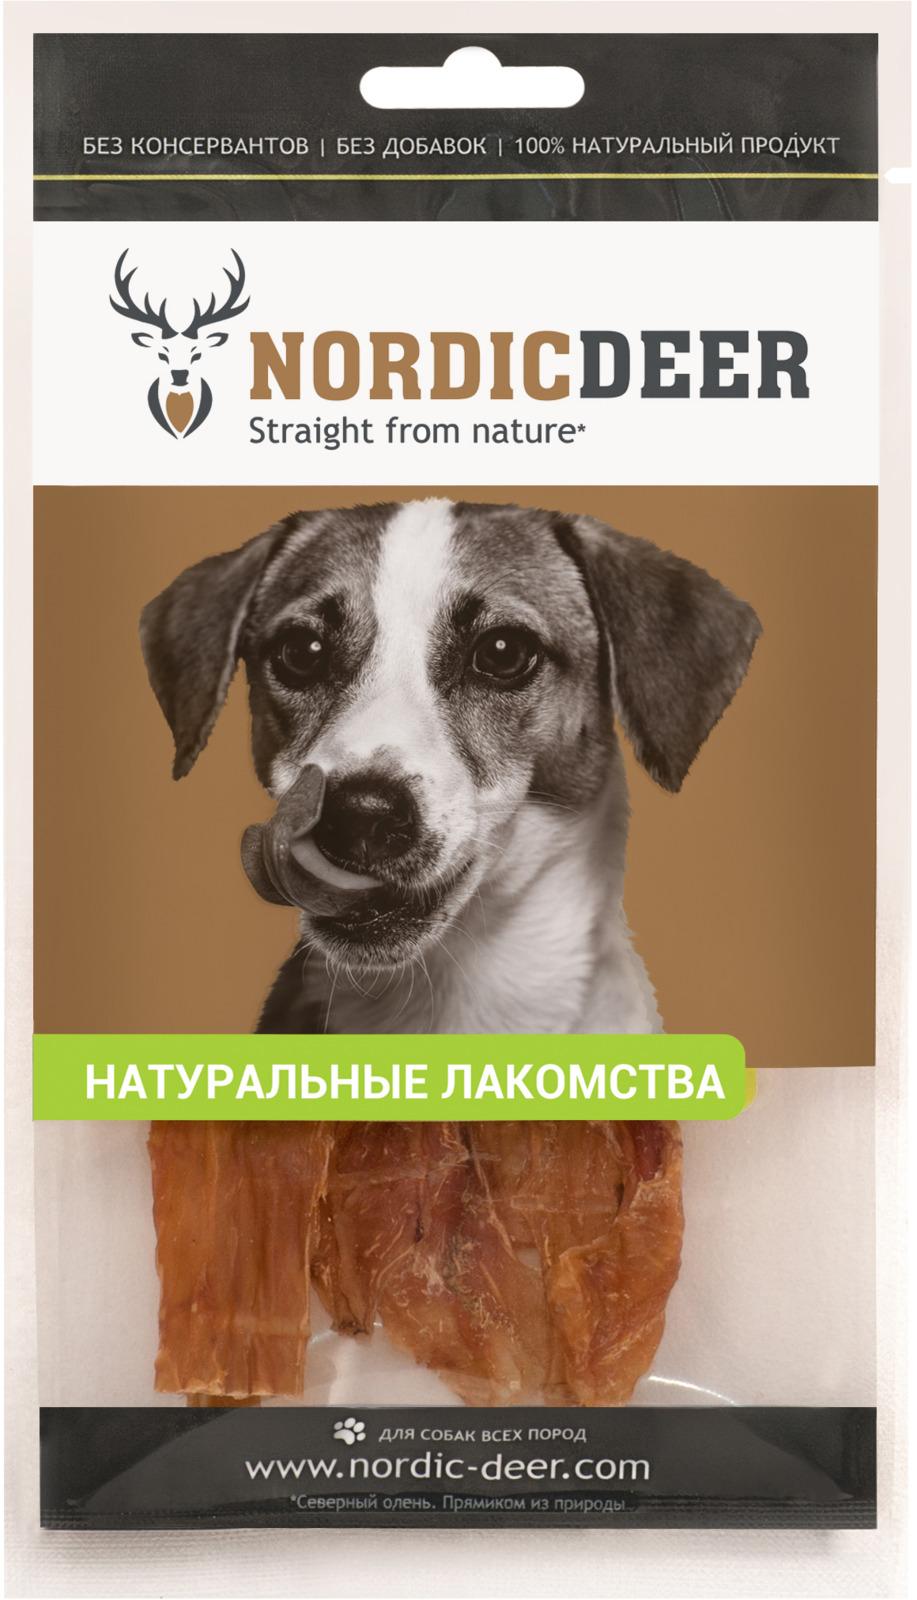 Лакомство для собак Nordic Deer Хорда говяжья, 15 см, 40 г nordic modern living room bedroom background simple english deer head decorative